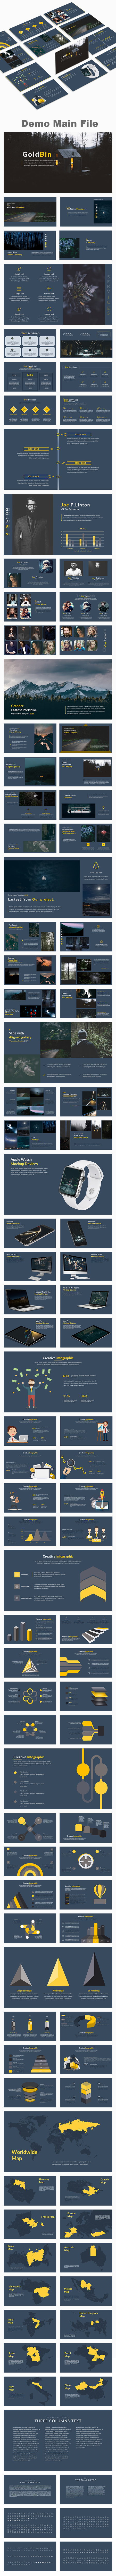 Goldbin Multipurpose Keynote Template - Creative Keynote Templates